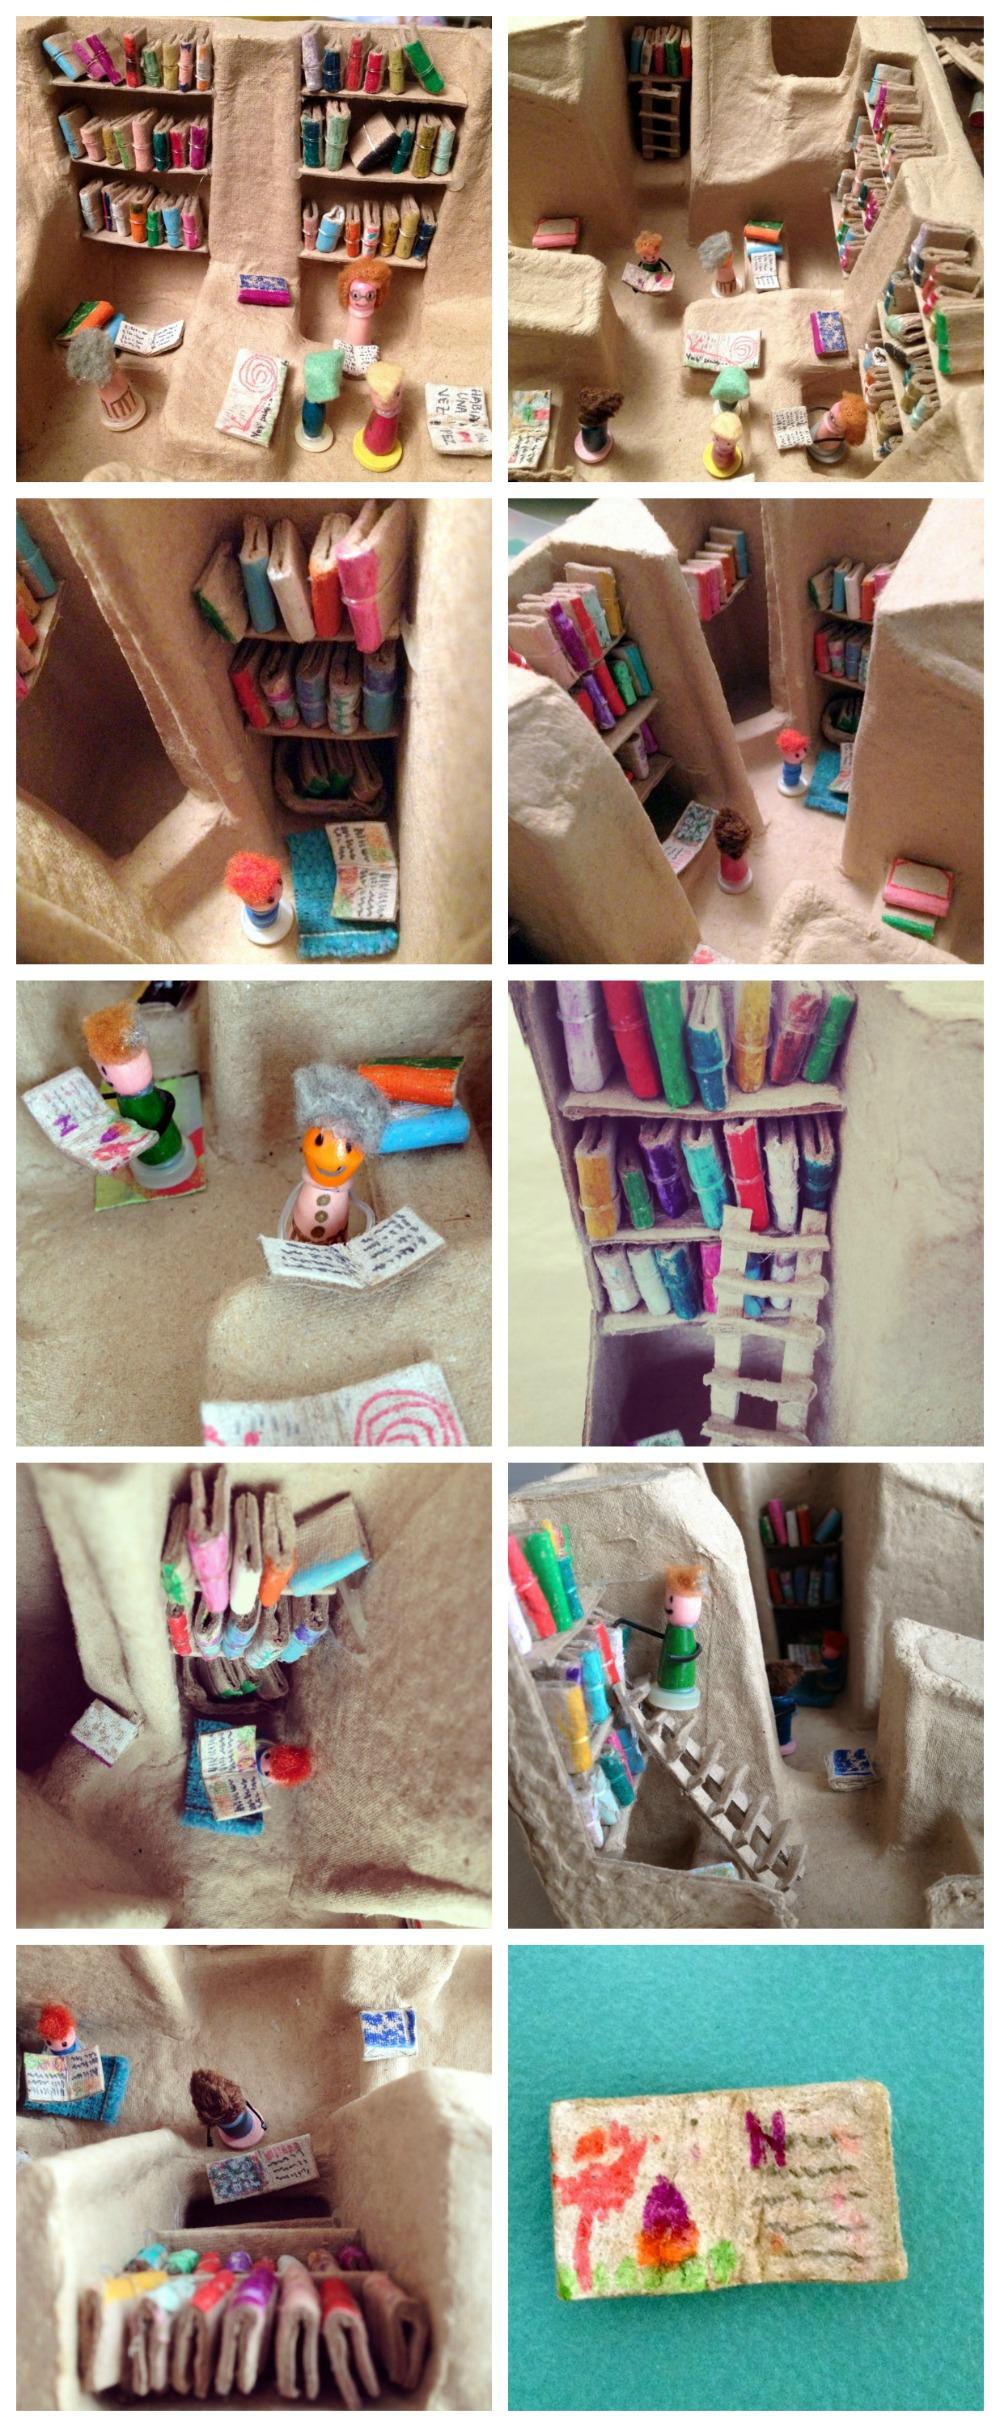 Adorable mini library